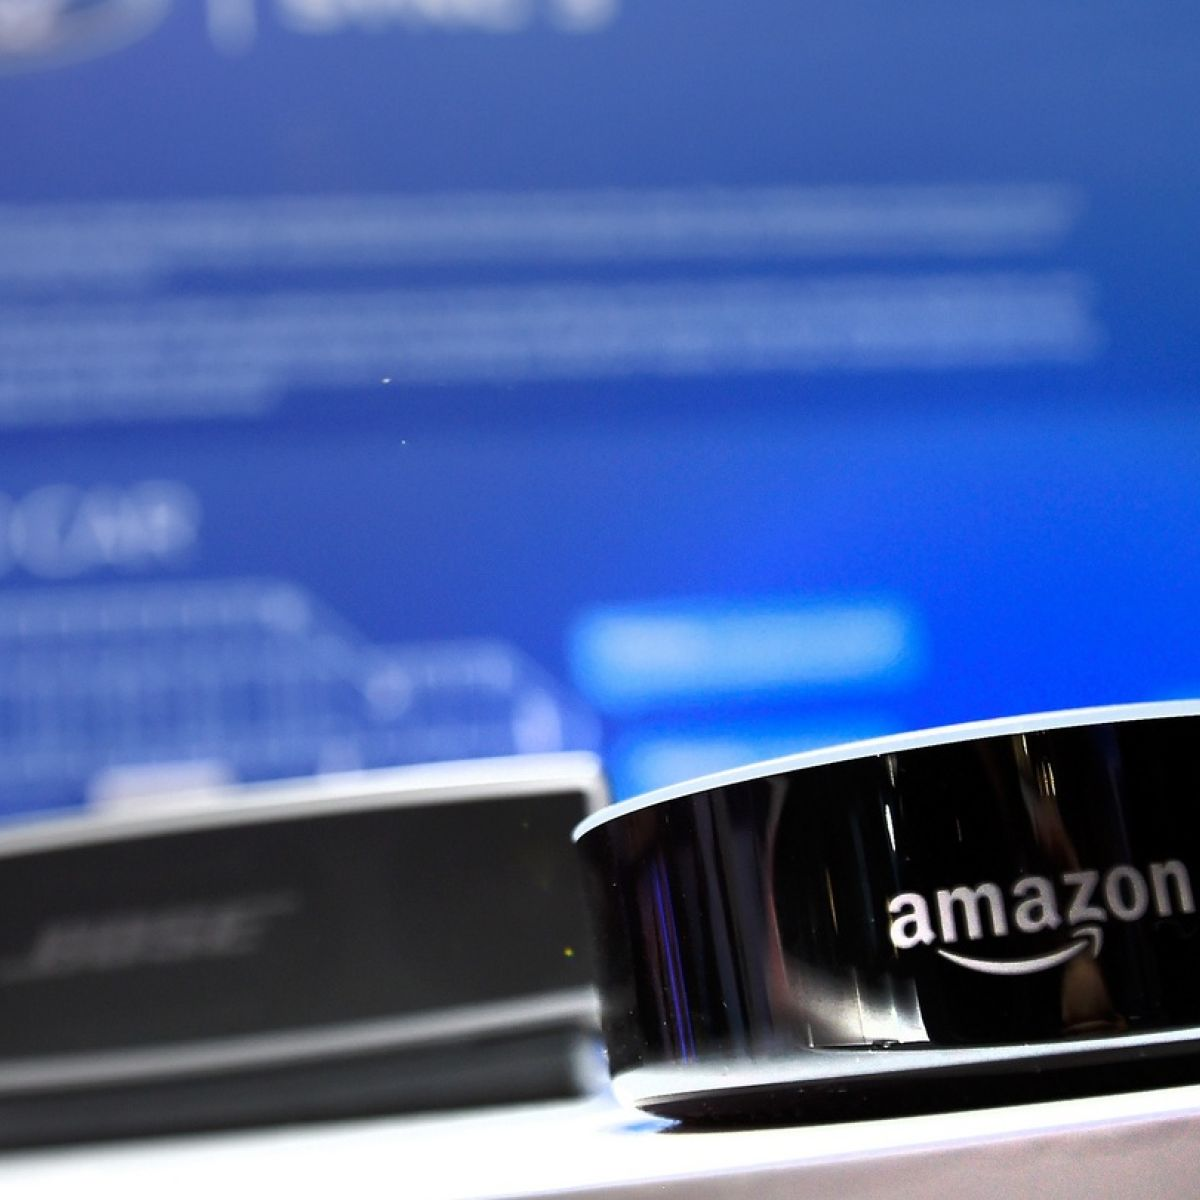 Irish radio stations launch Alexa services as Amazon starts shipping